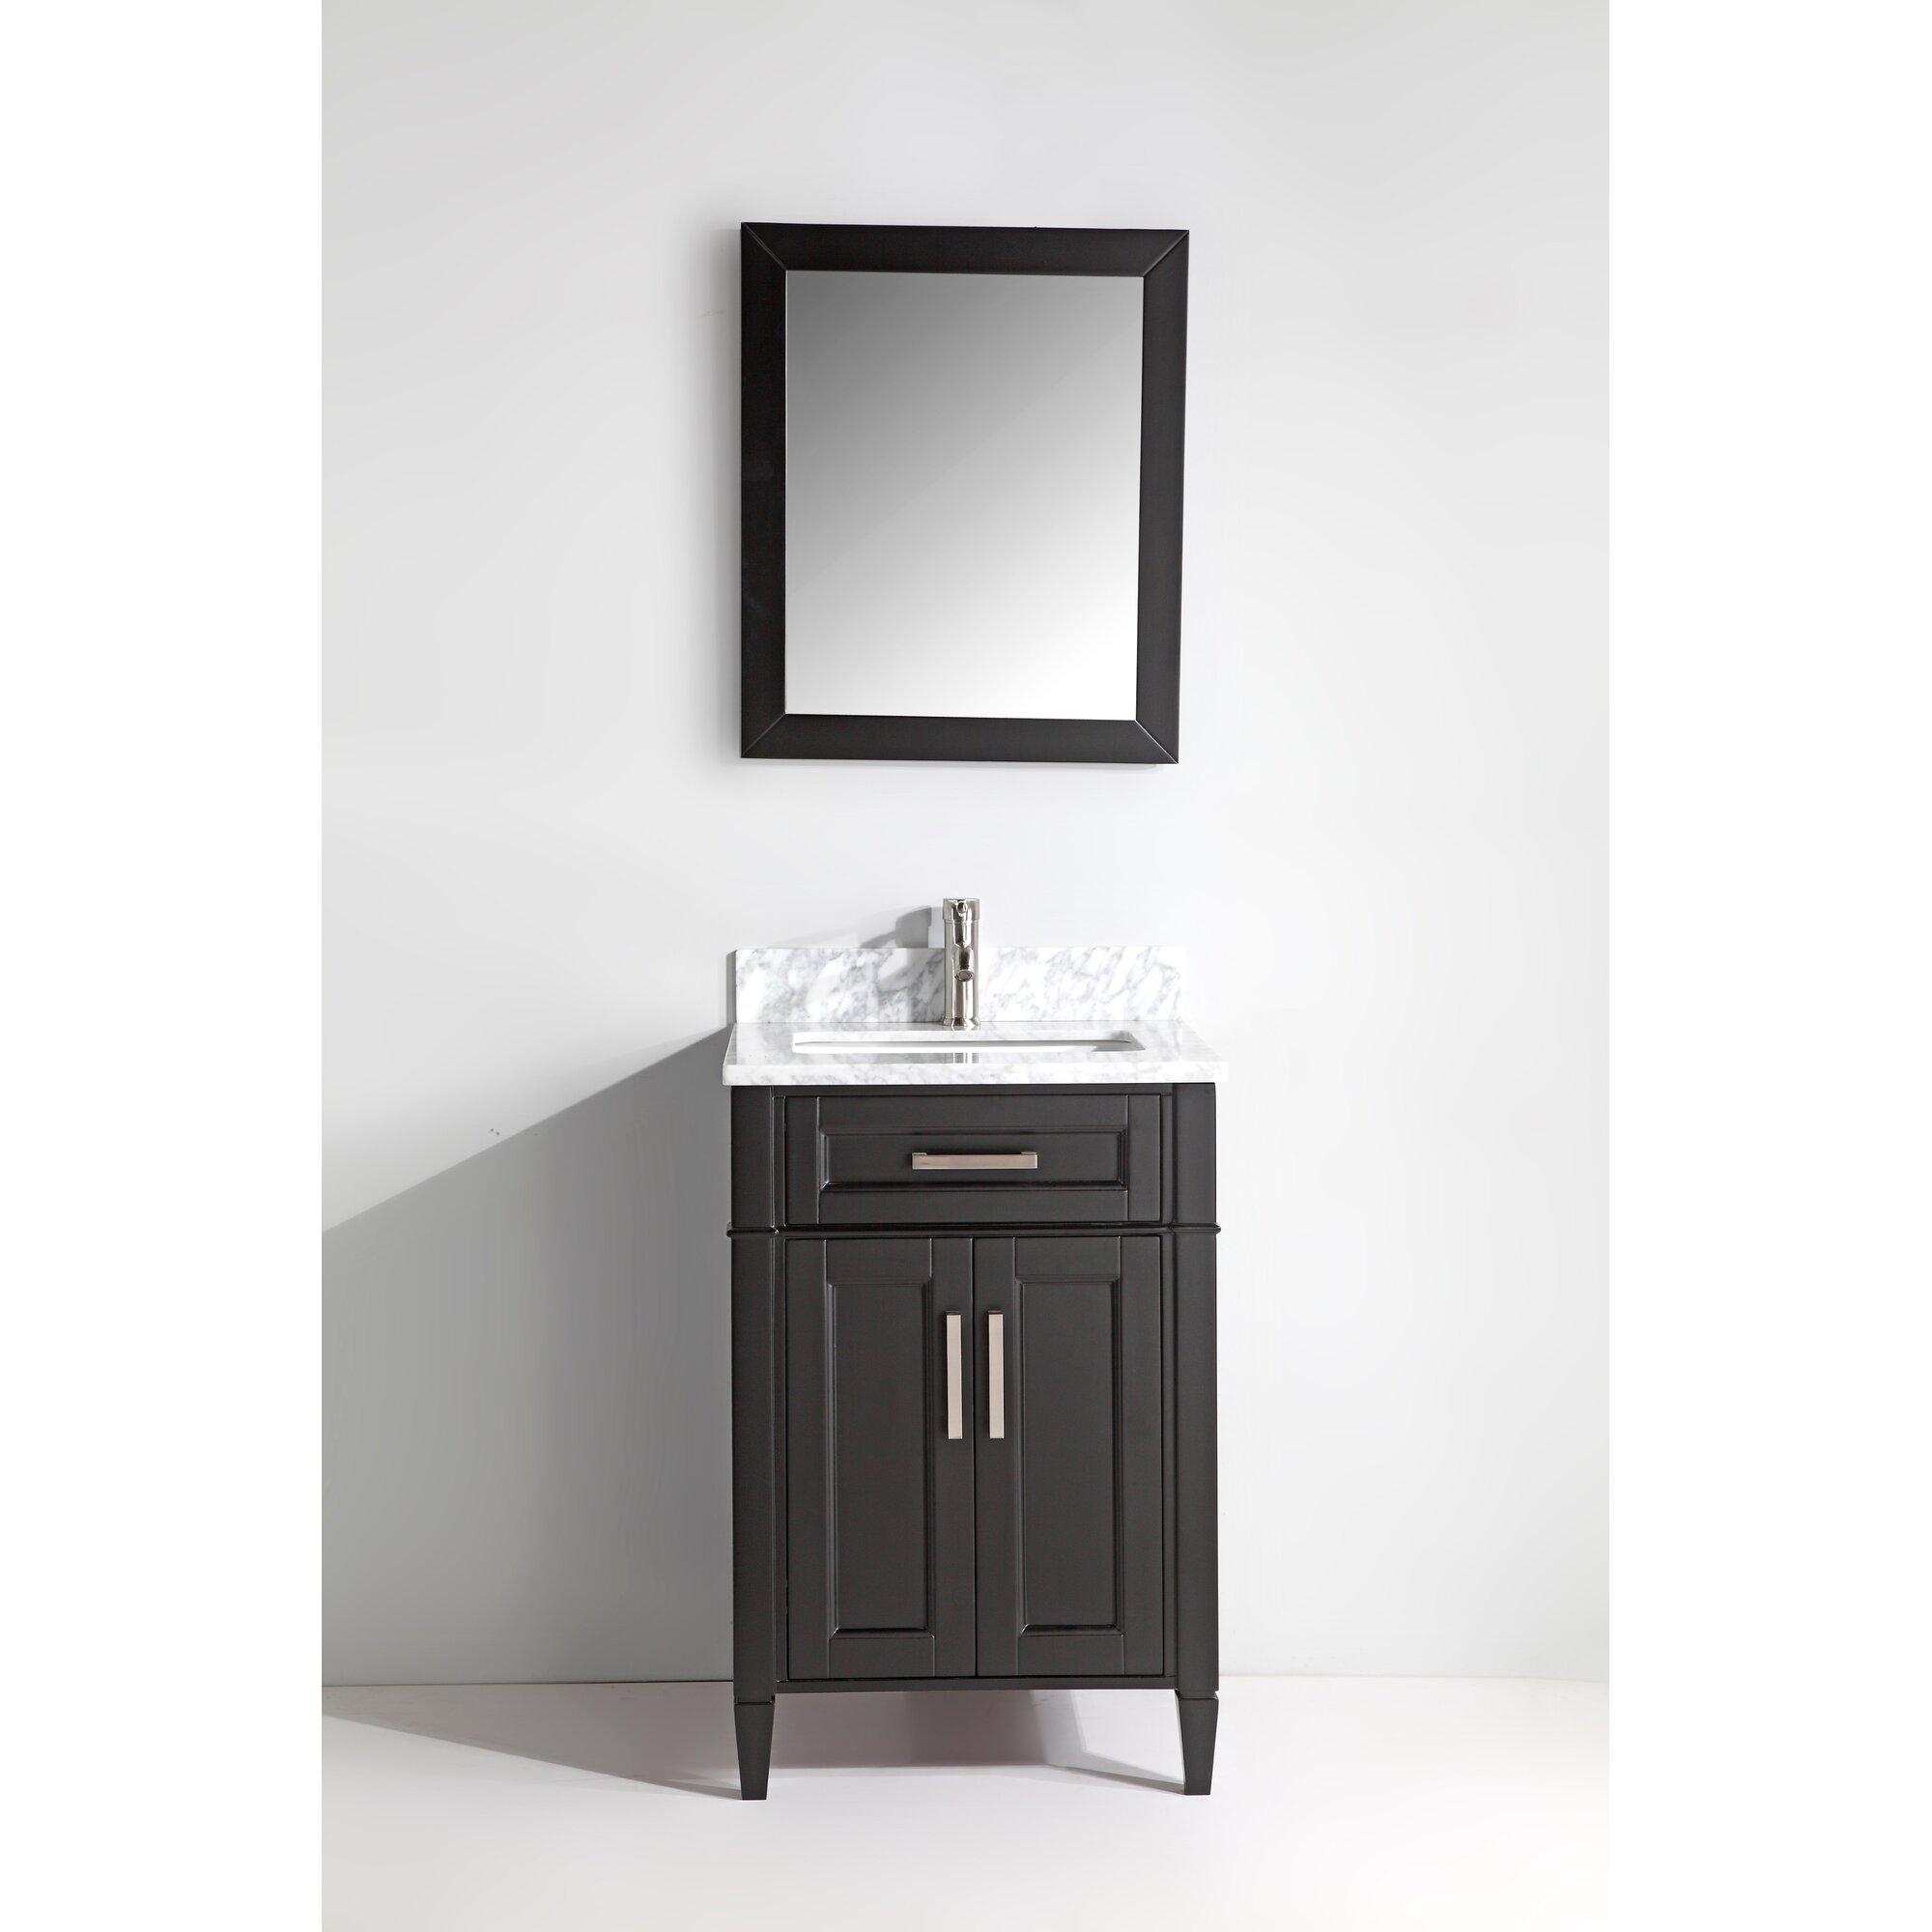 Vanity art carrara marble 24quot single bathroom vanity with for Carrara marble bathroom vanity